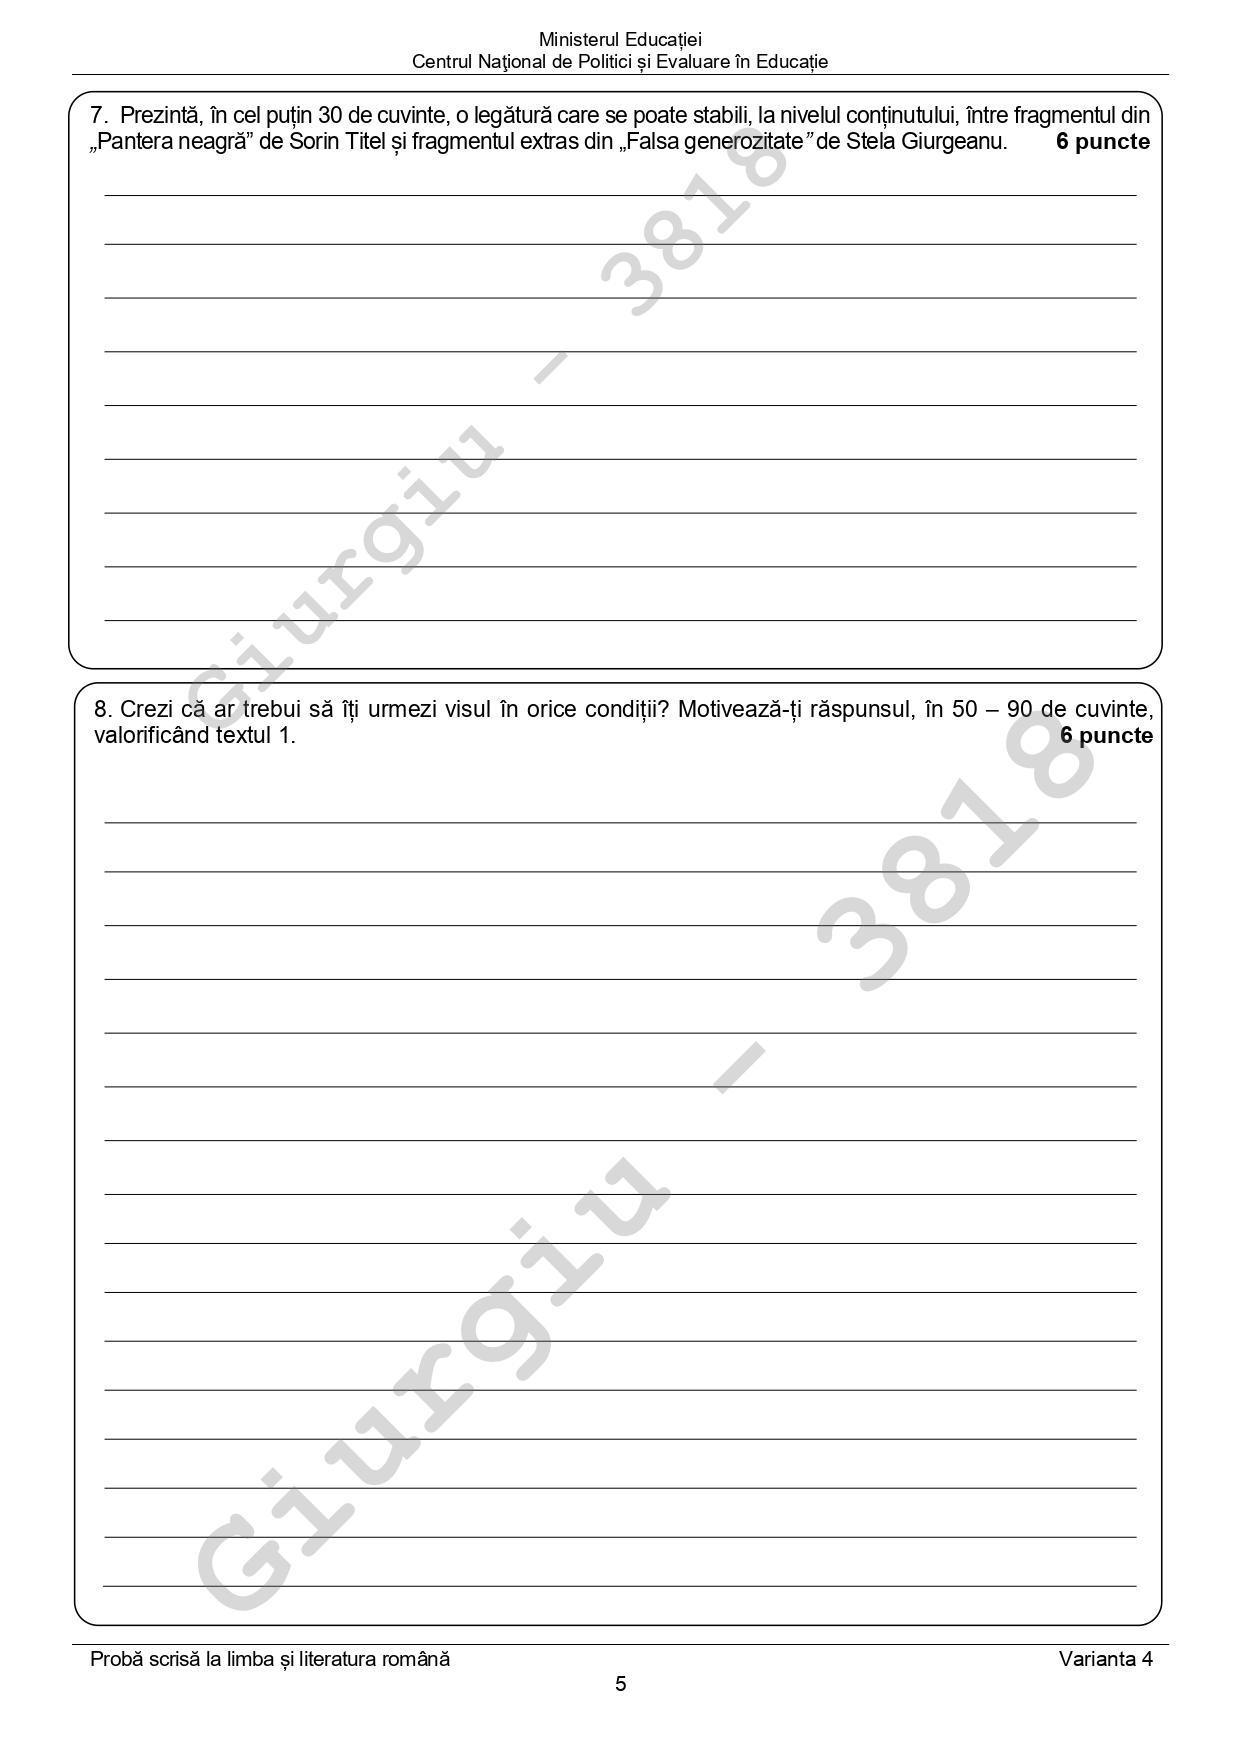 pagina 8 la subiectele la romana primite la evaluarea nationala 2021